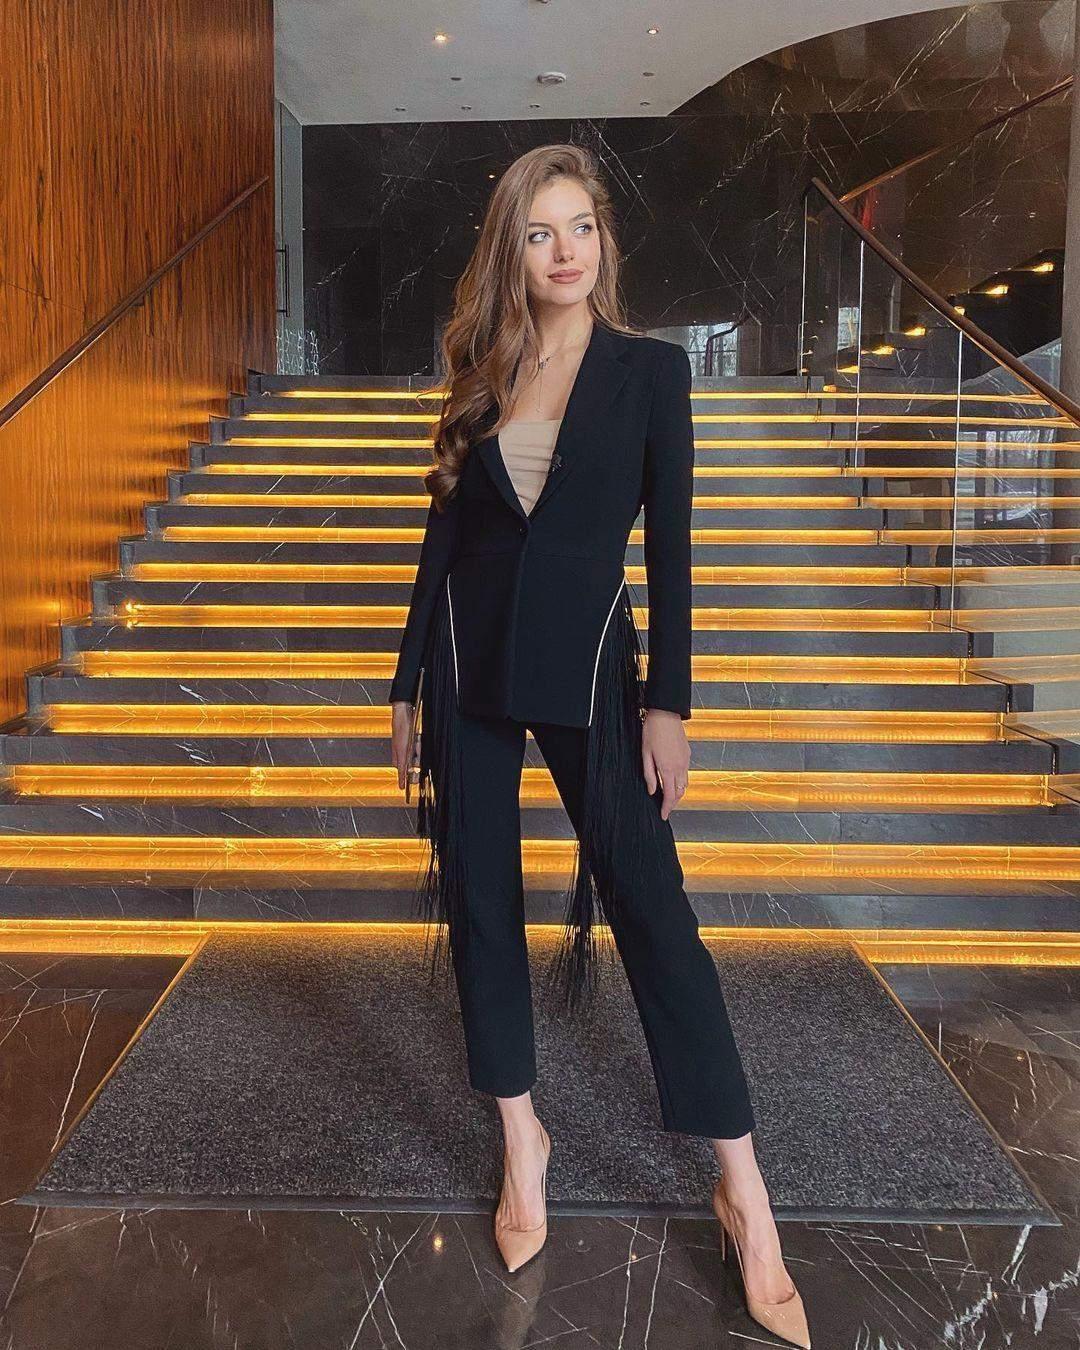 Олександра Кучеренко в костюмі за 13 тисяч гривень